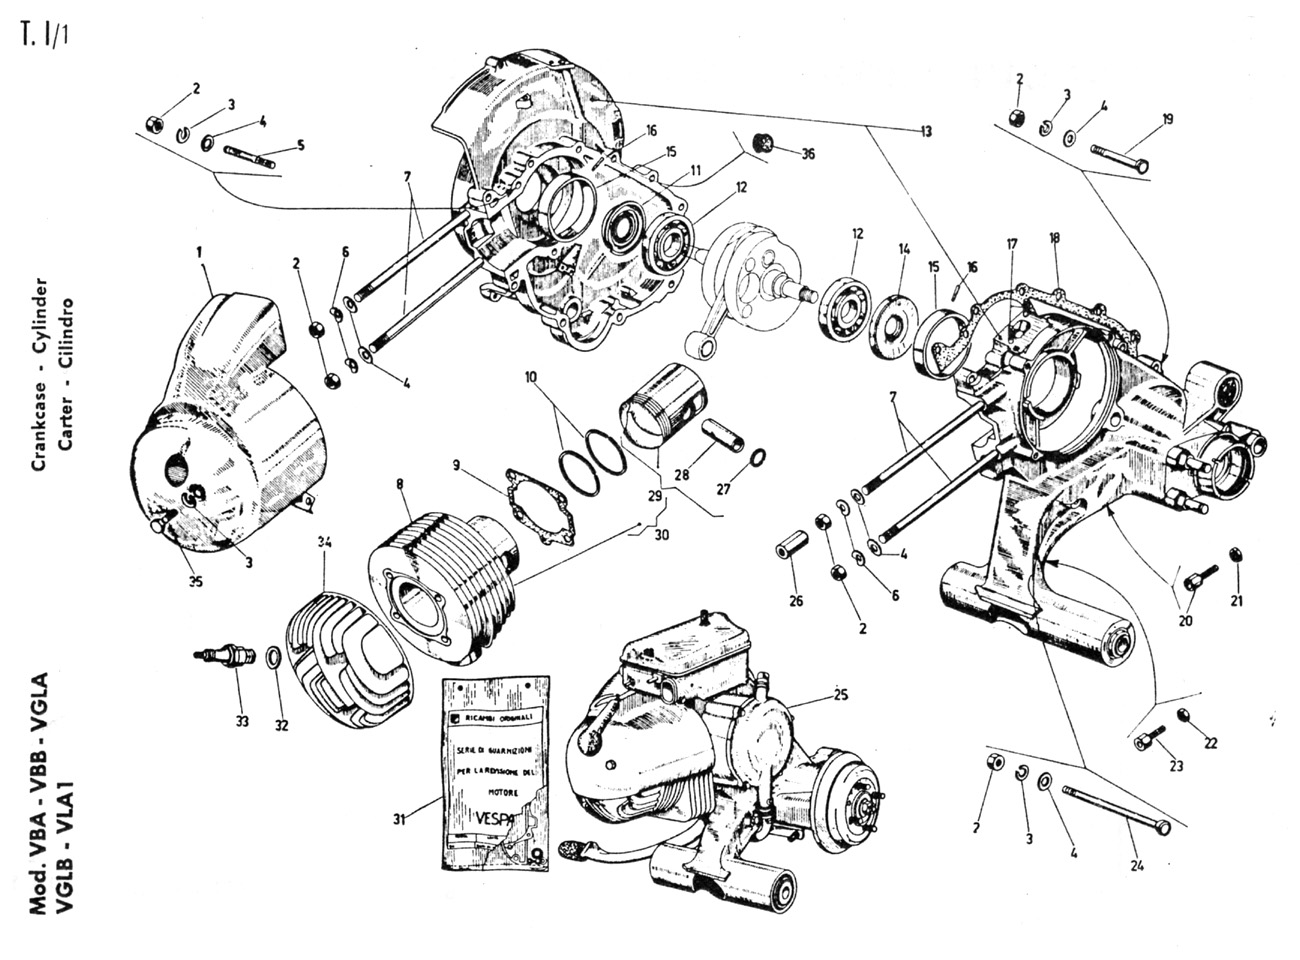 Vespa Et2 Engine Diagram Trusted Wiring Diagrams Yamaha Vino Scooter Mahindra